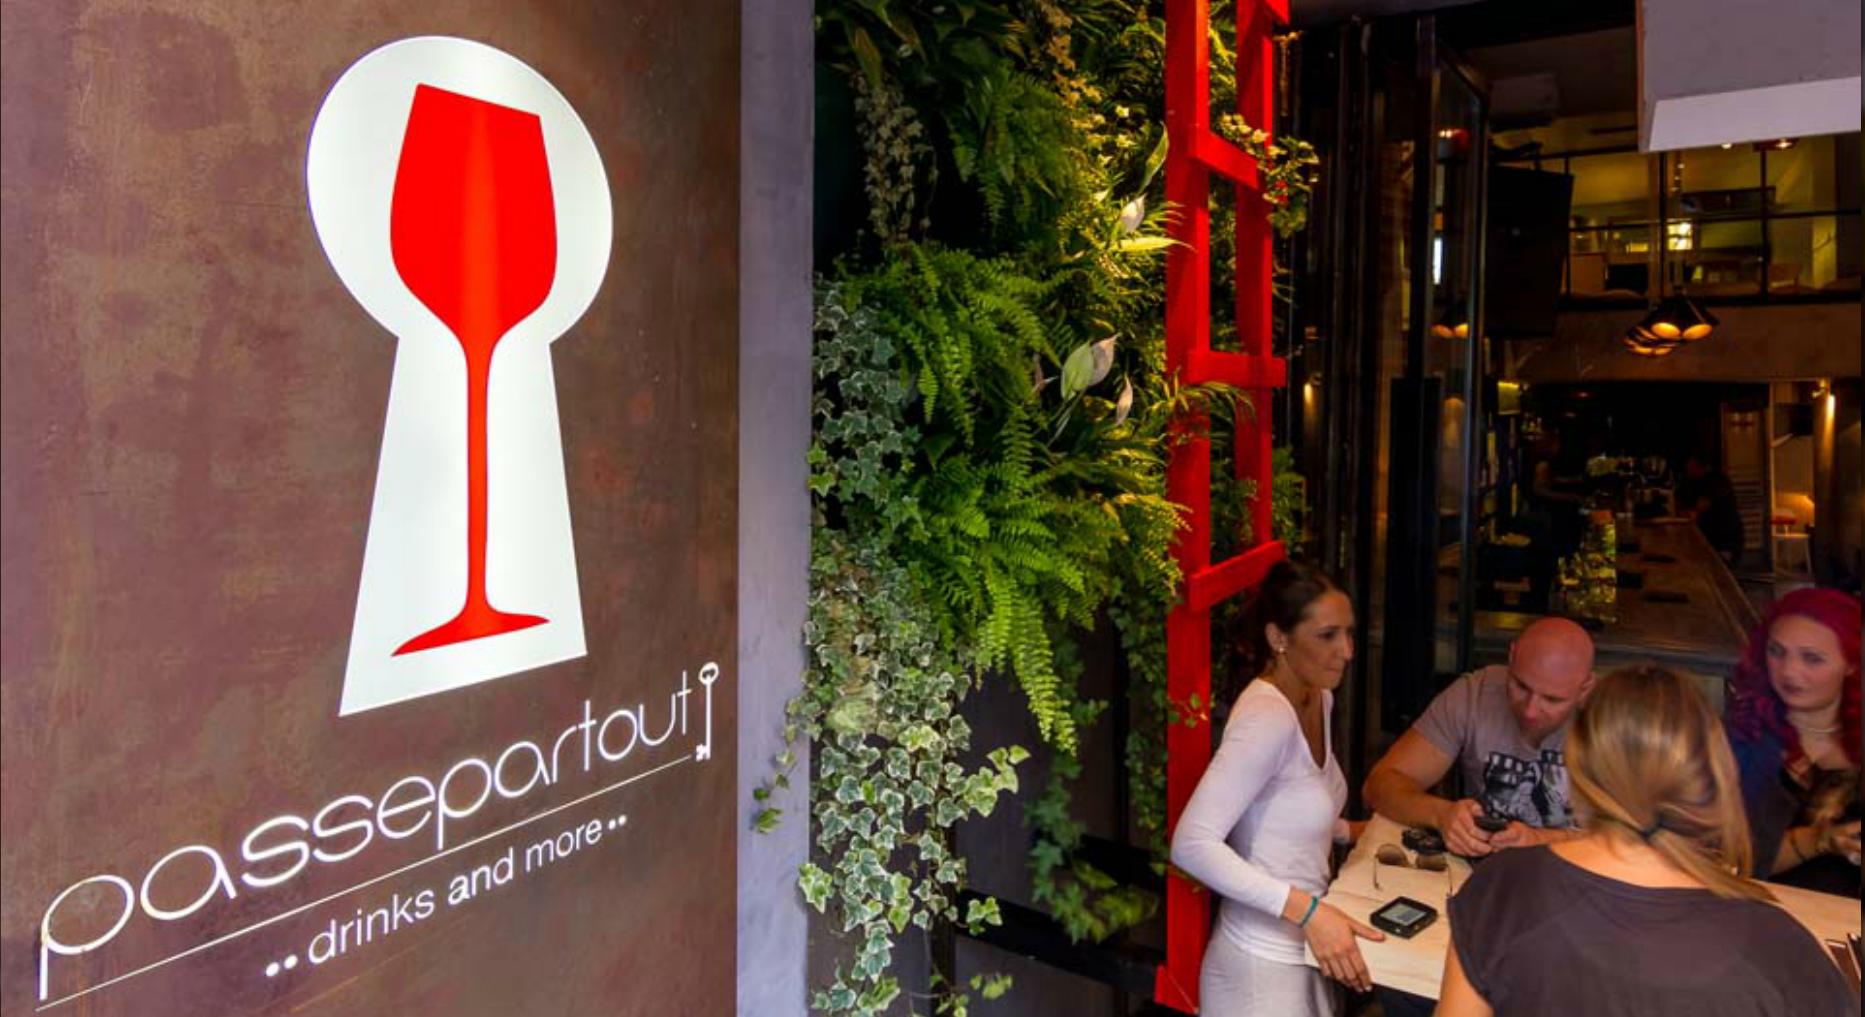 Passepartout All day music bar restaurant